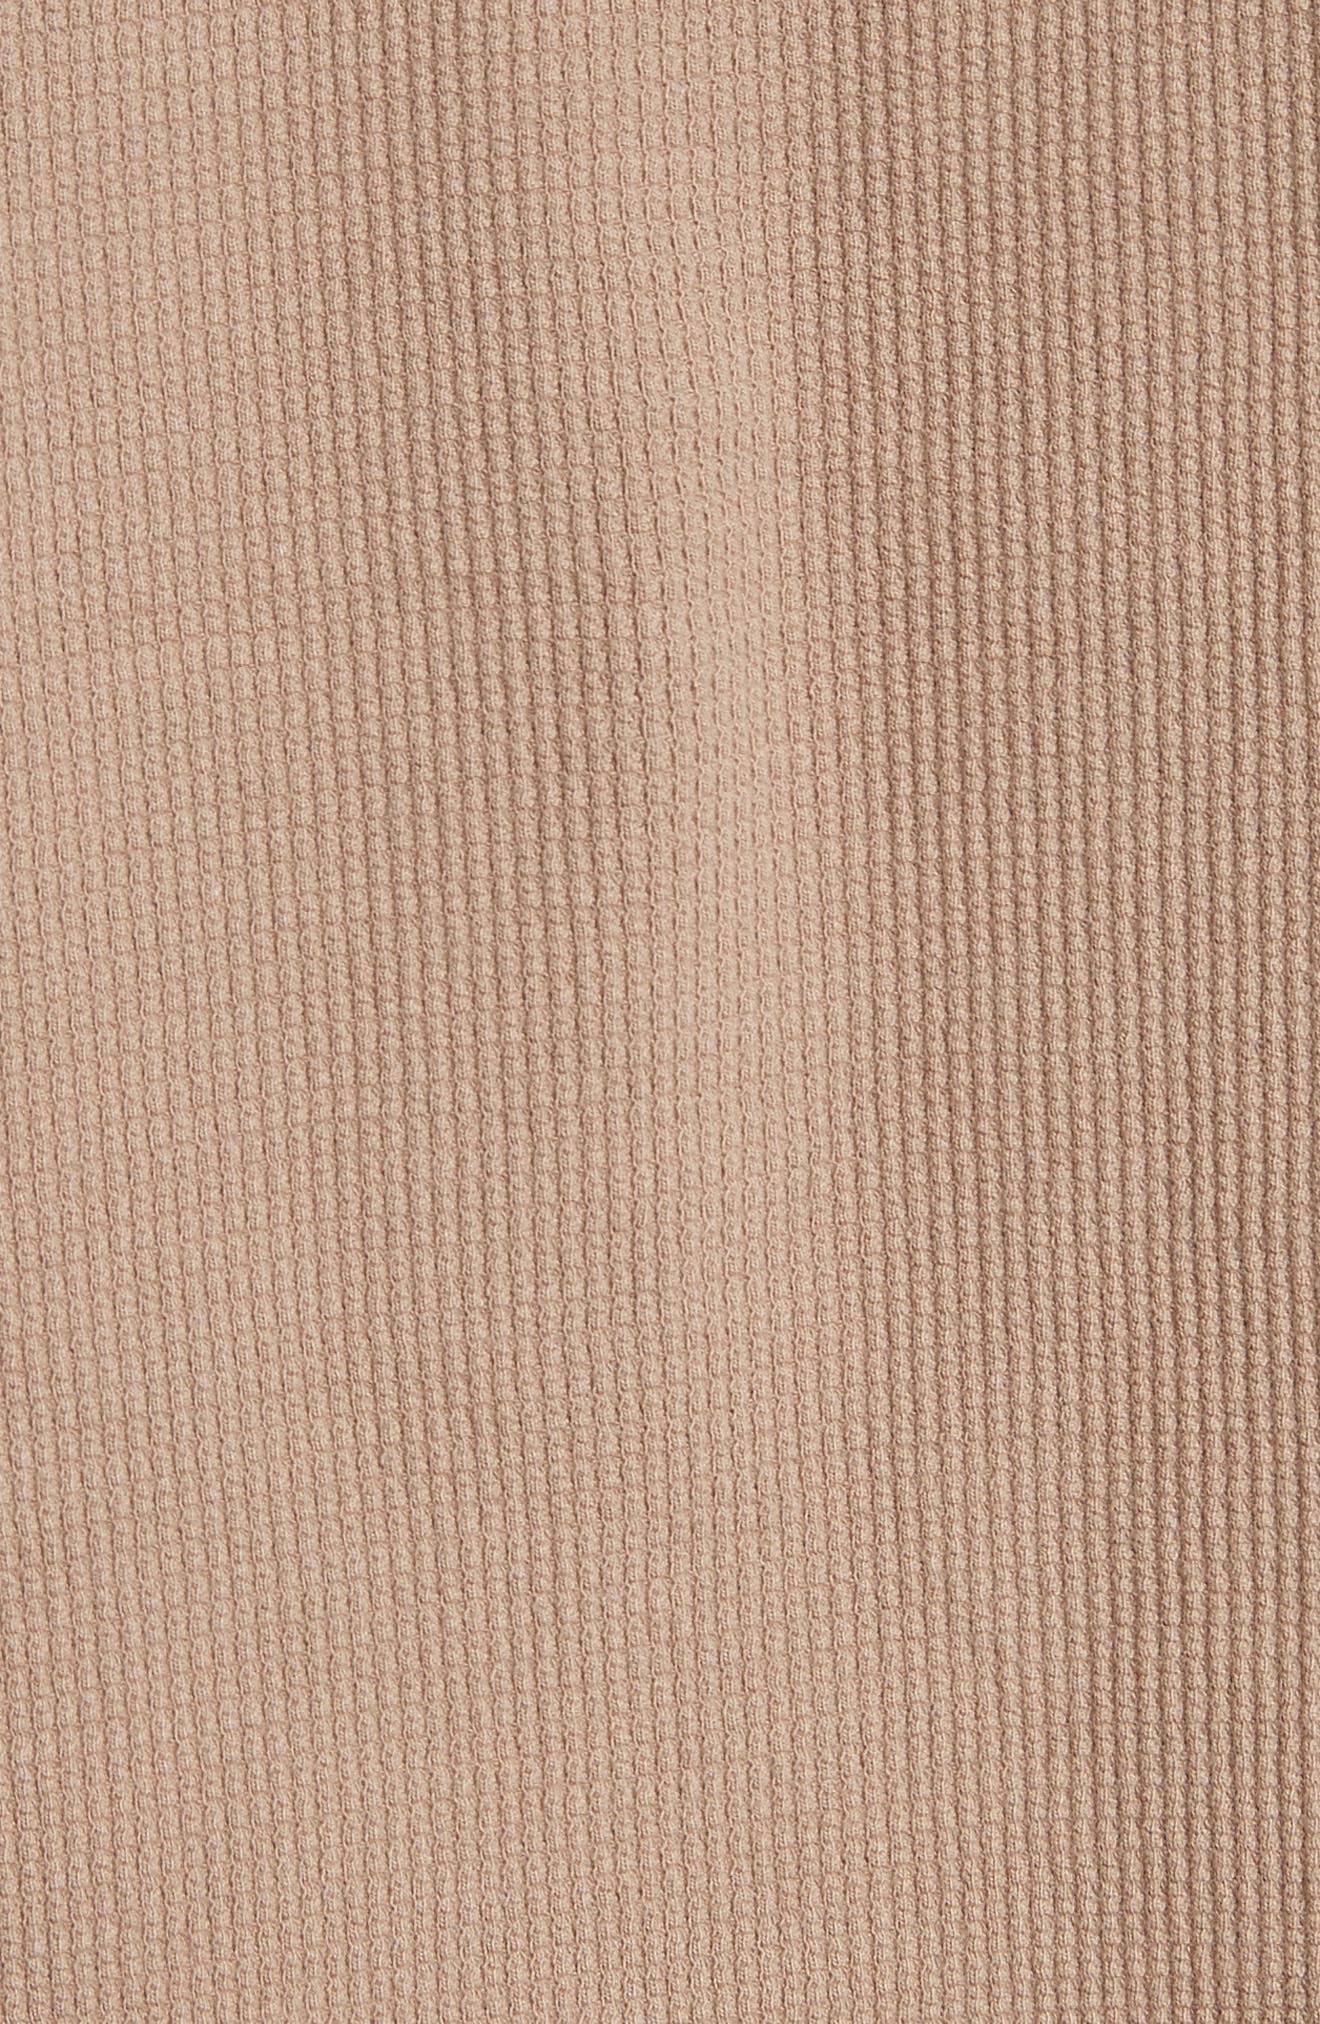 Crewneck Sweater,                             Alternate thumbnail 5, color,                             Mushroom